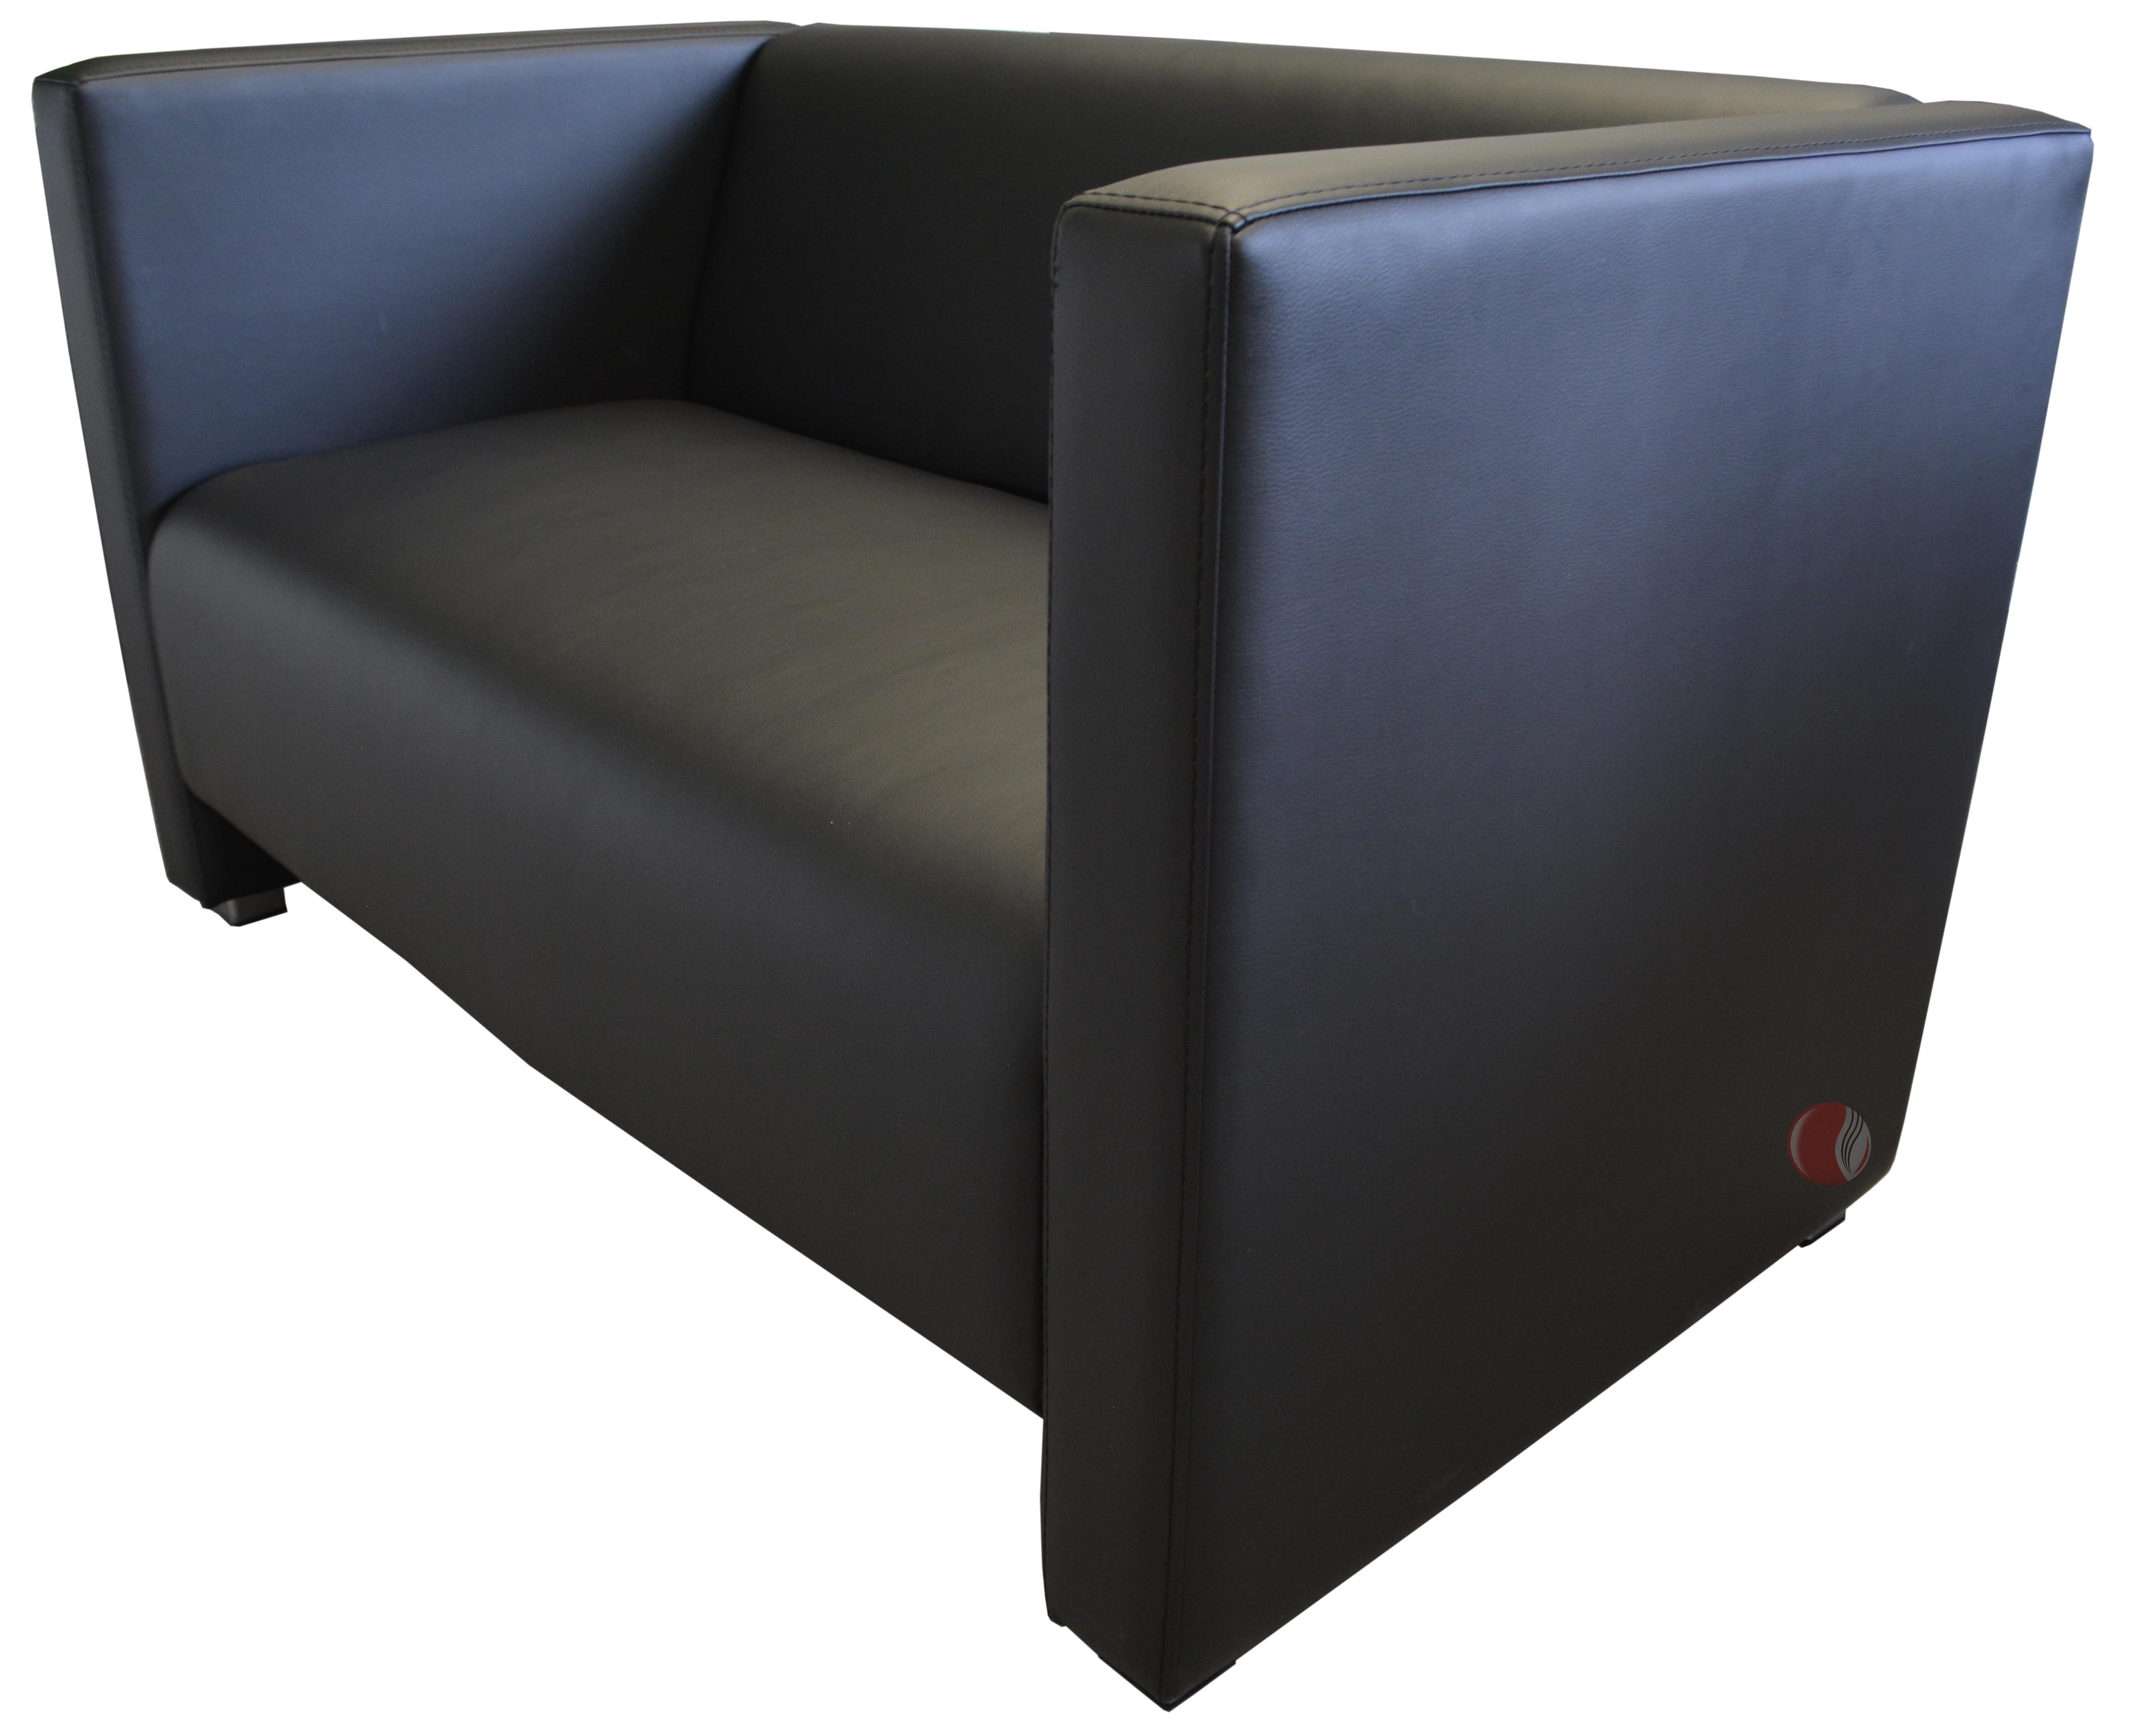 lounge sofa 2 sitzer reka 125 cm schwarz g nstig kaufen m bel star. Black Bedroom Furniture Sets. Home Design Ideas